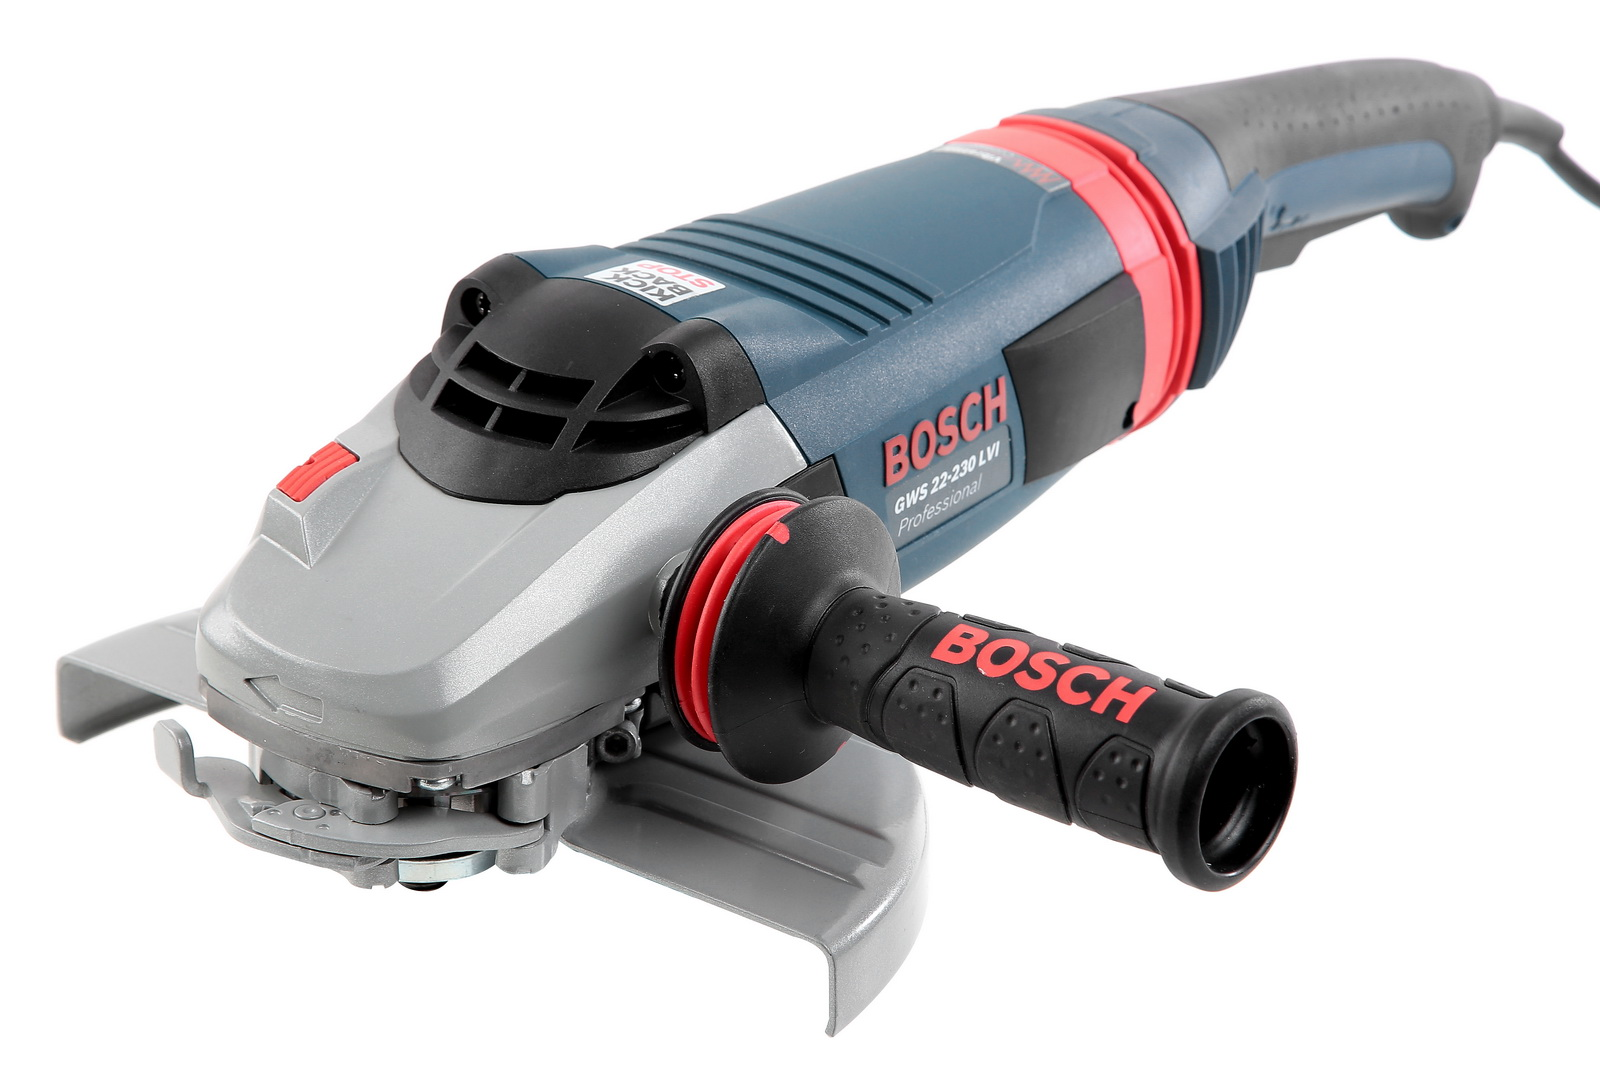 УШМ (болгарка) Bosch Gws 22-230 lvi (0.601.891.d00) угловая шлифмашина bosch gws 26 230 lvi 0 601 895 f04